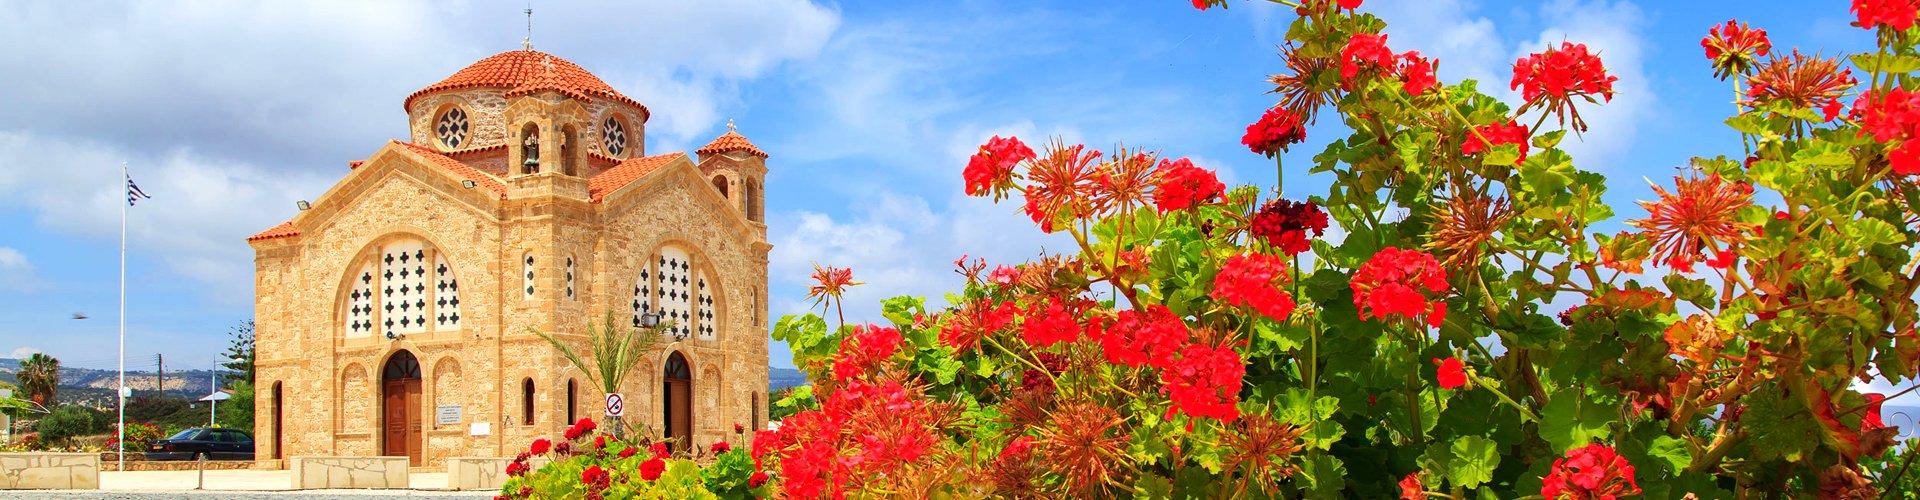 Orthodox kerkje in Cyprus